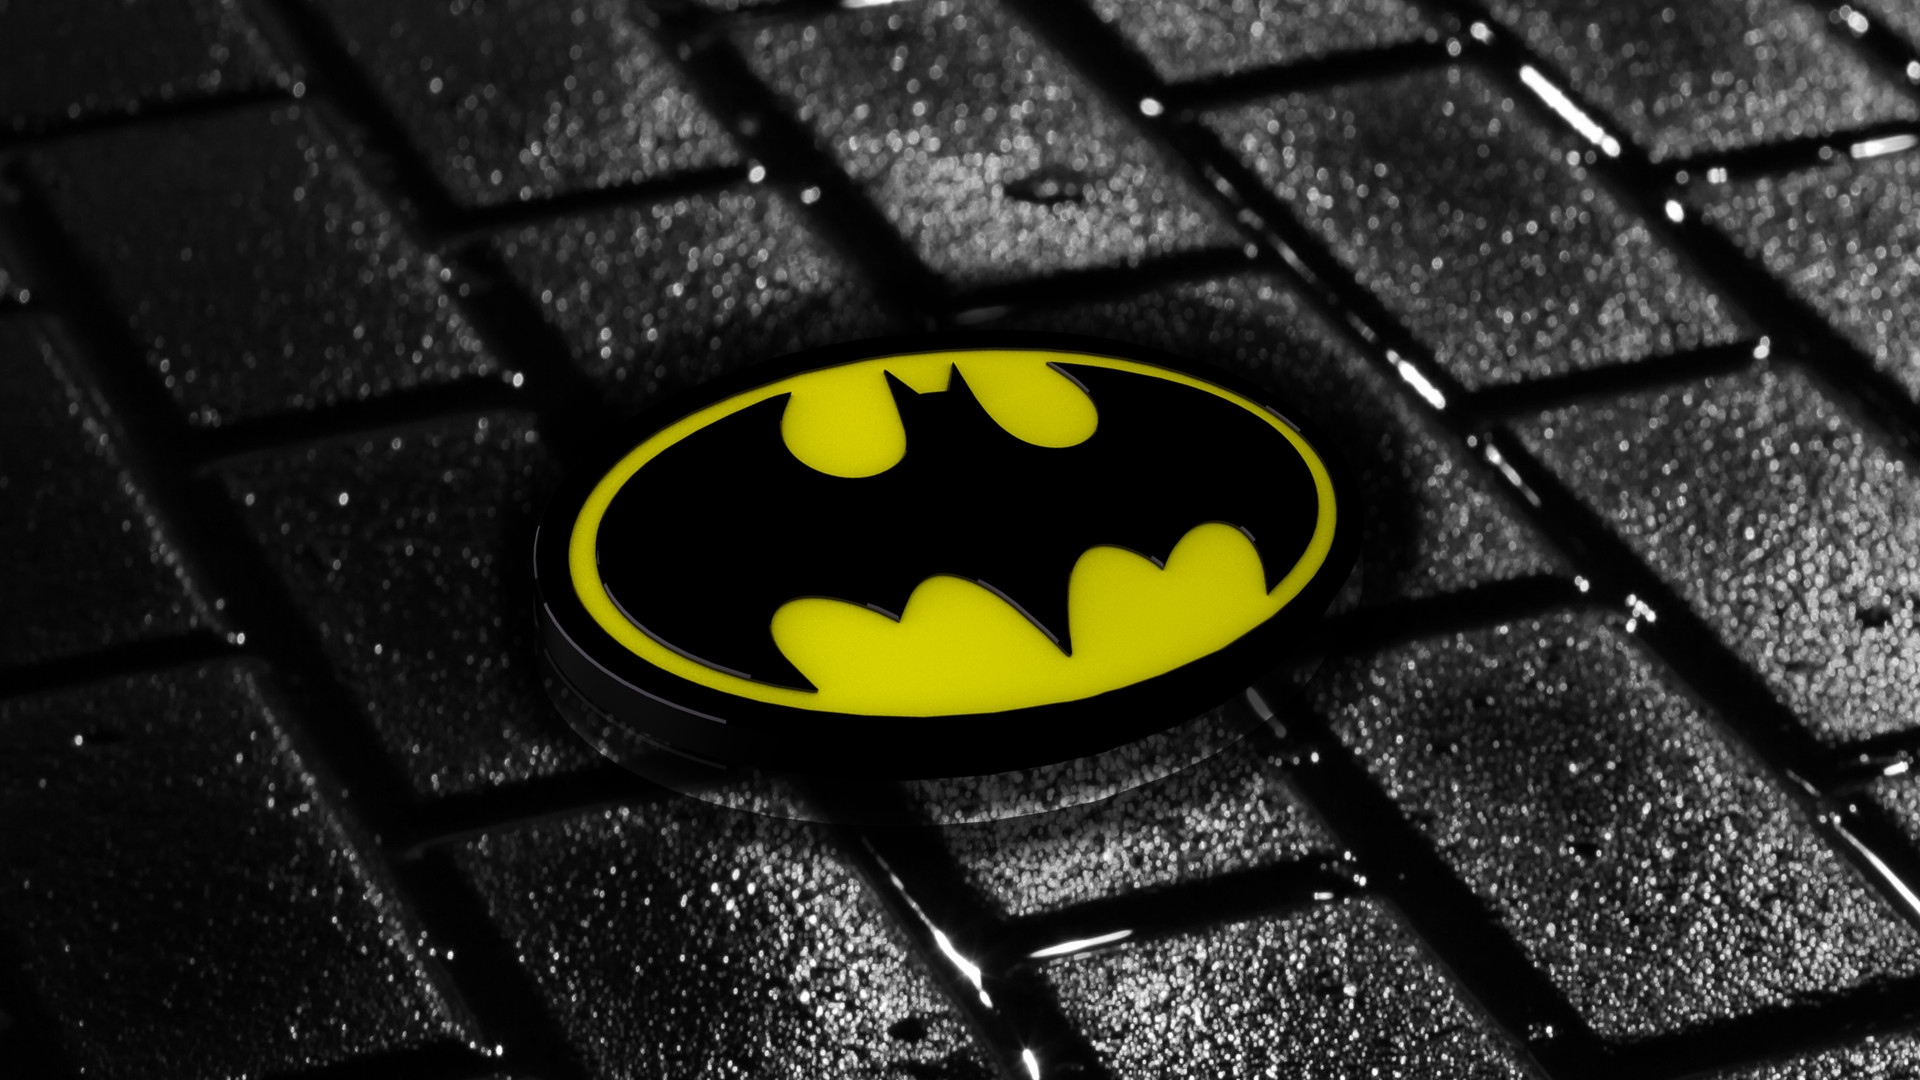 1920x1080 10 Batman Logo Wallpaper HD Download7 600x338 Download